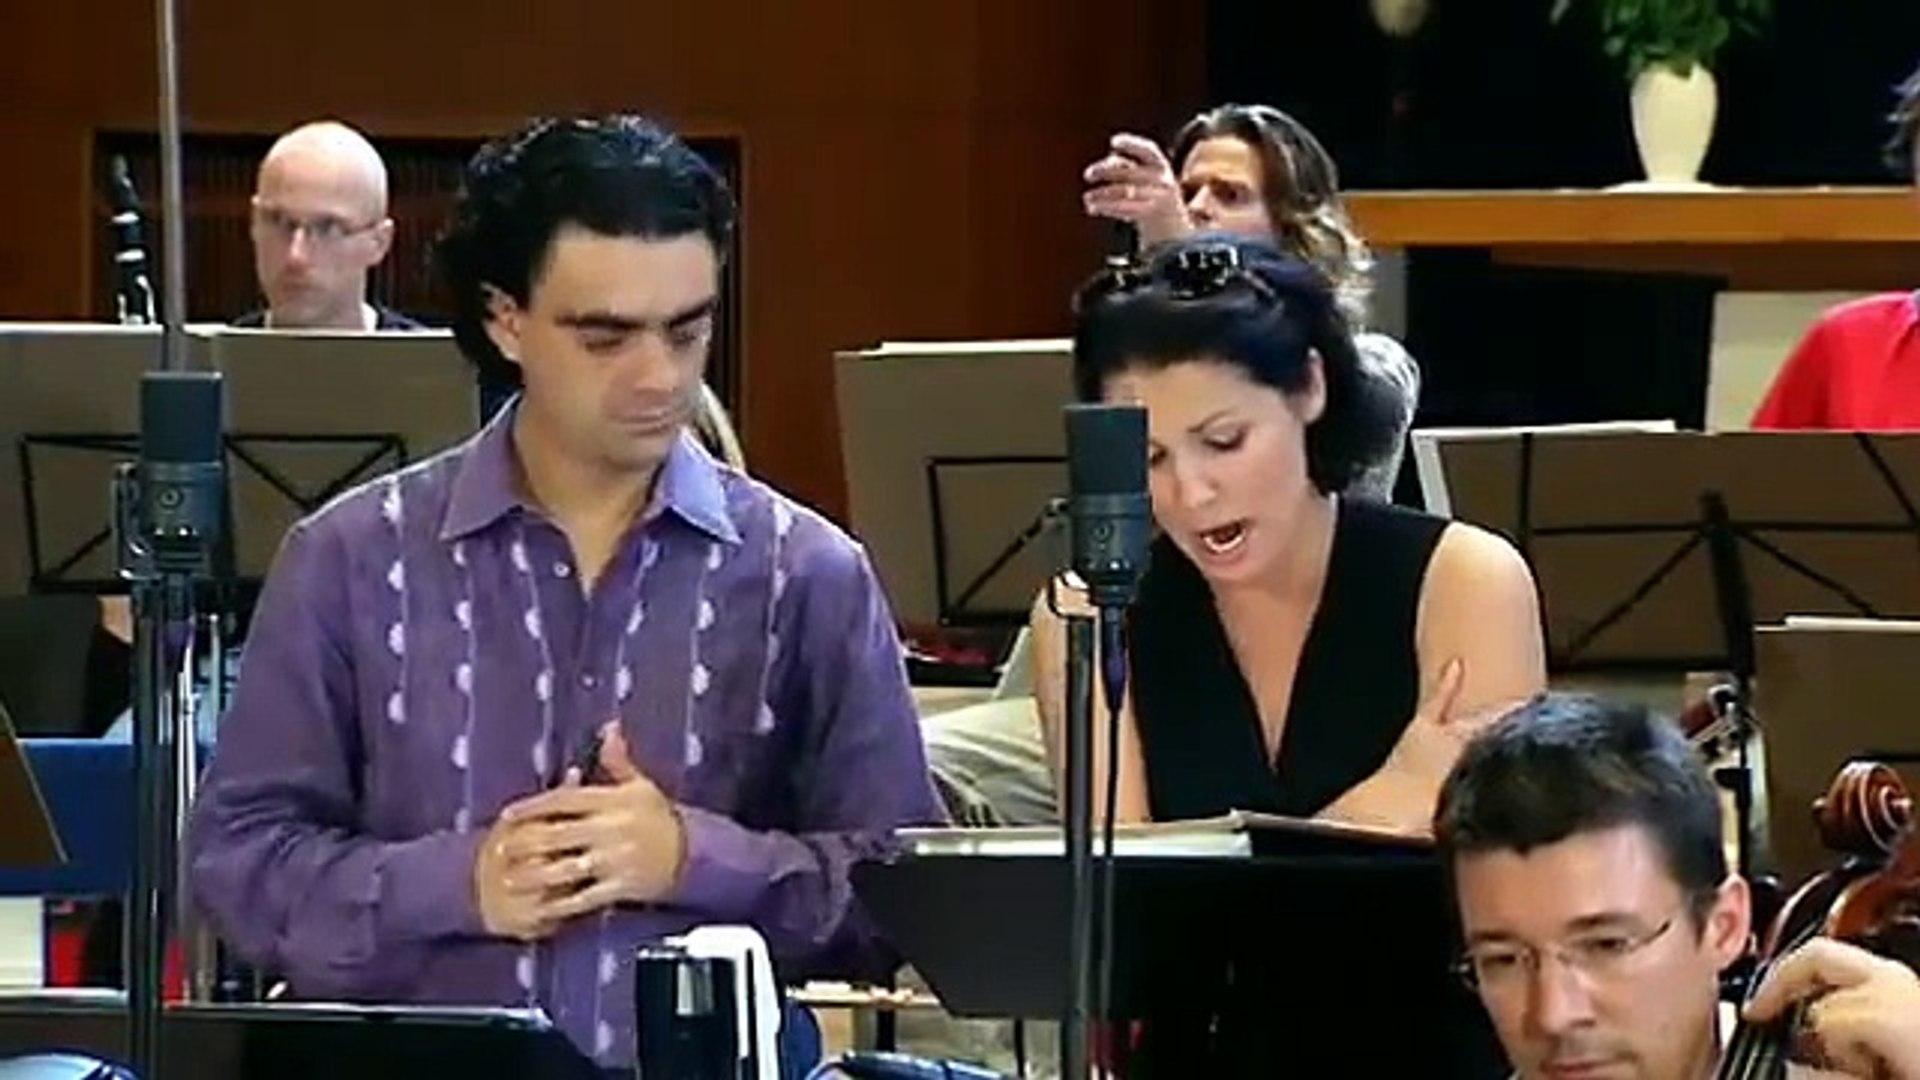 Anna Netrebko & Rolando Villazón - Duets (Album Trailer)